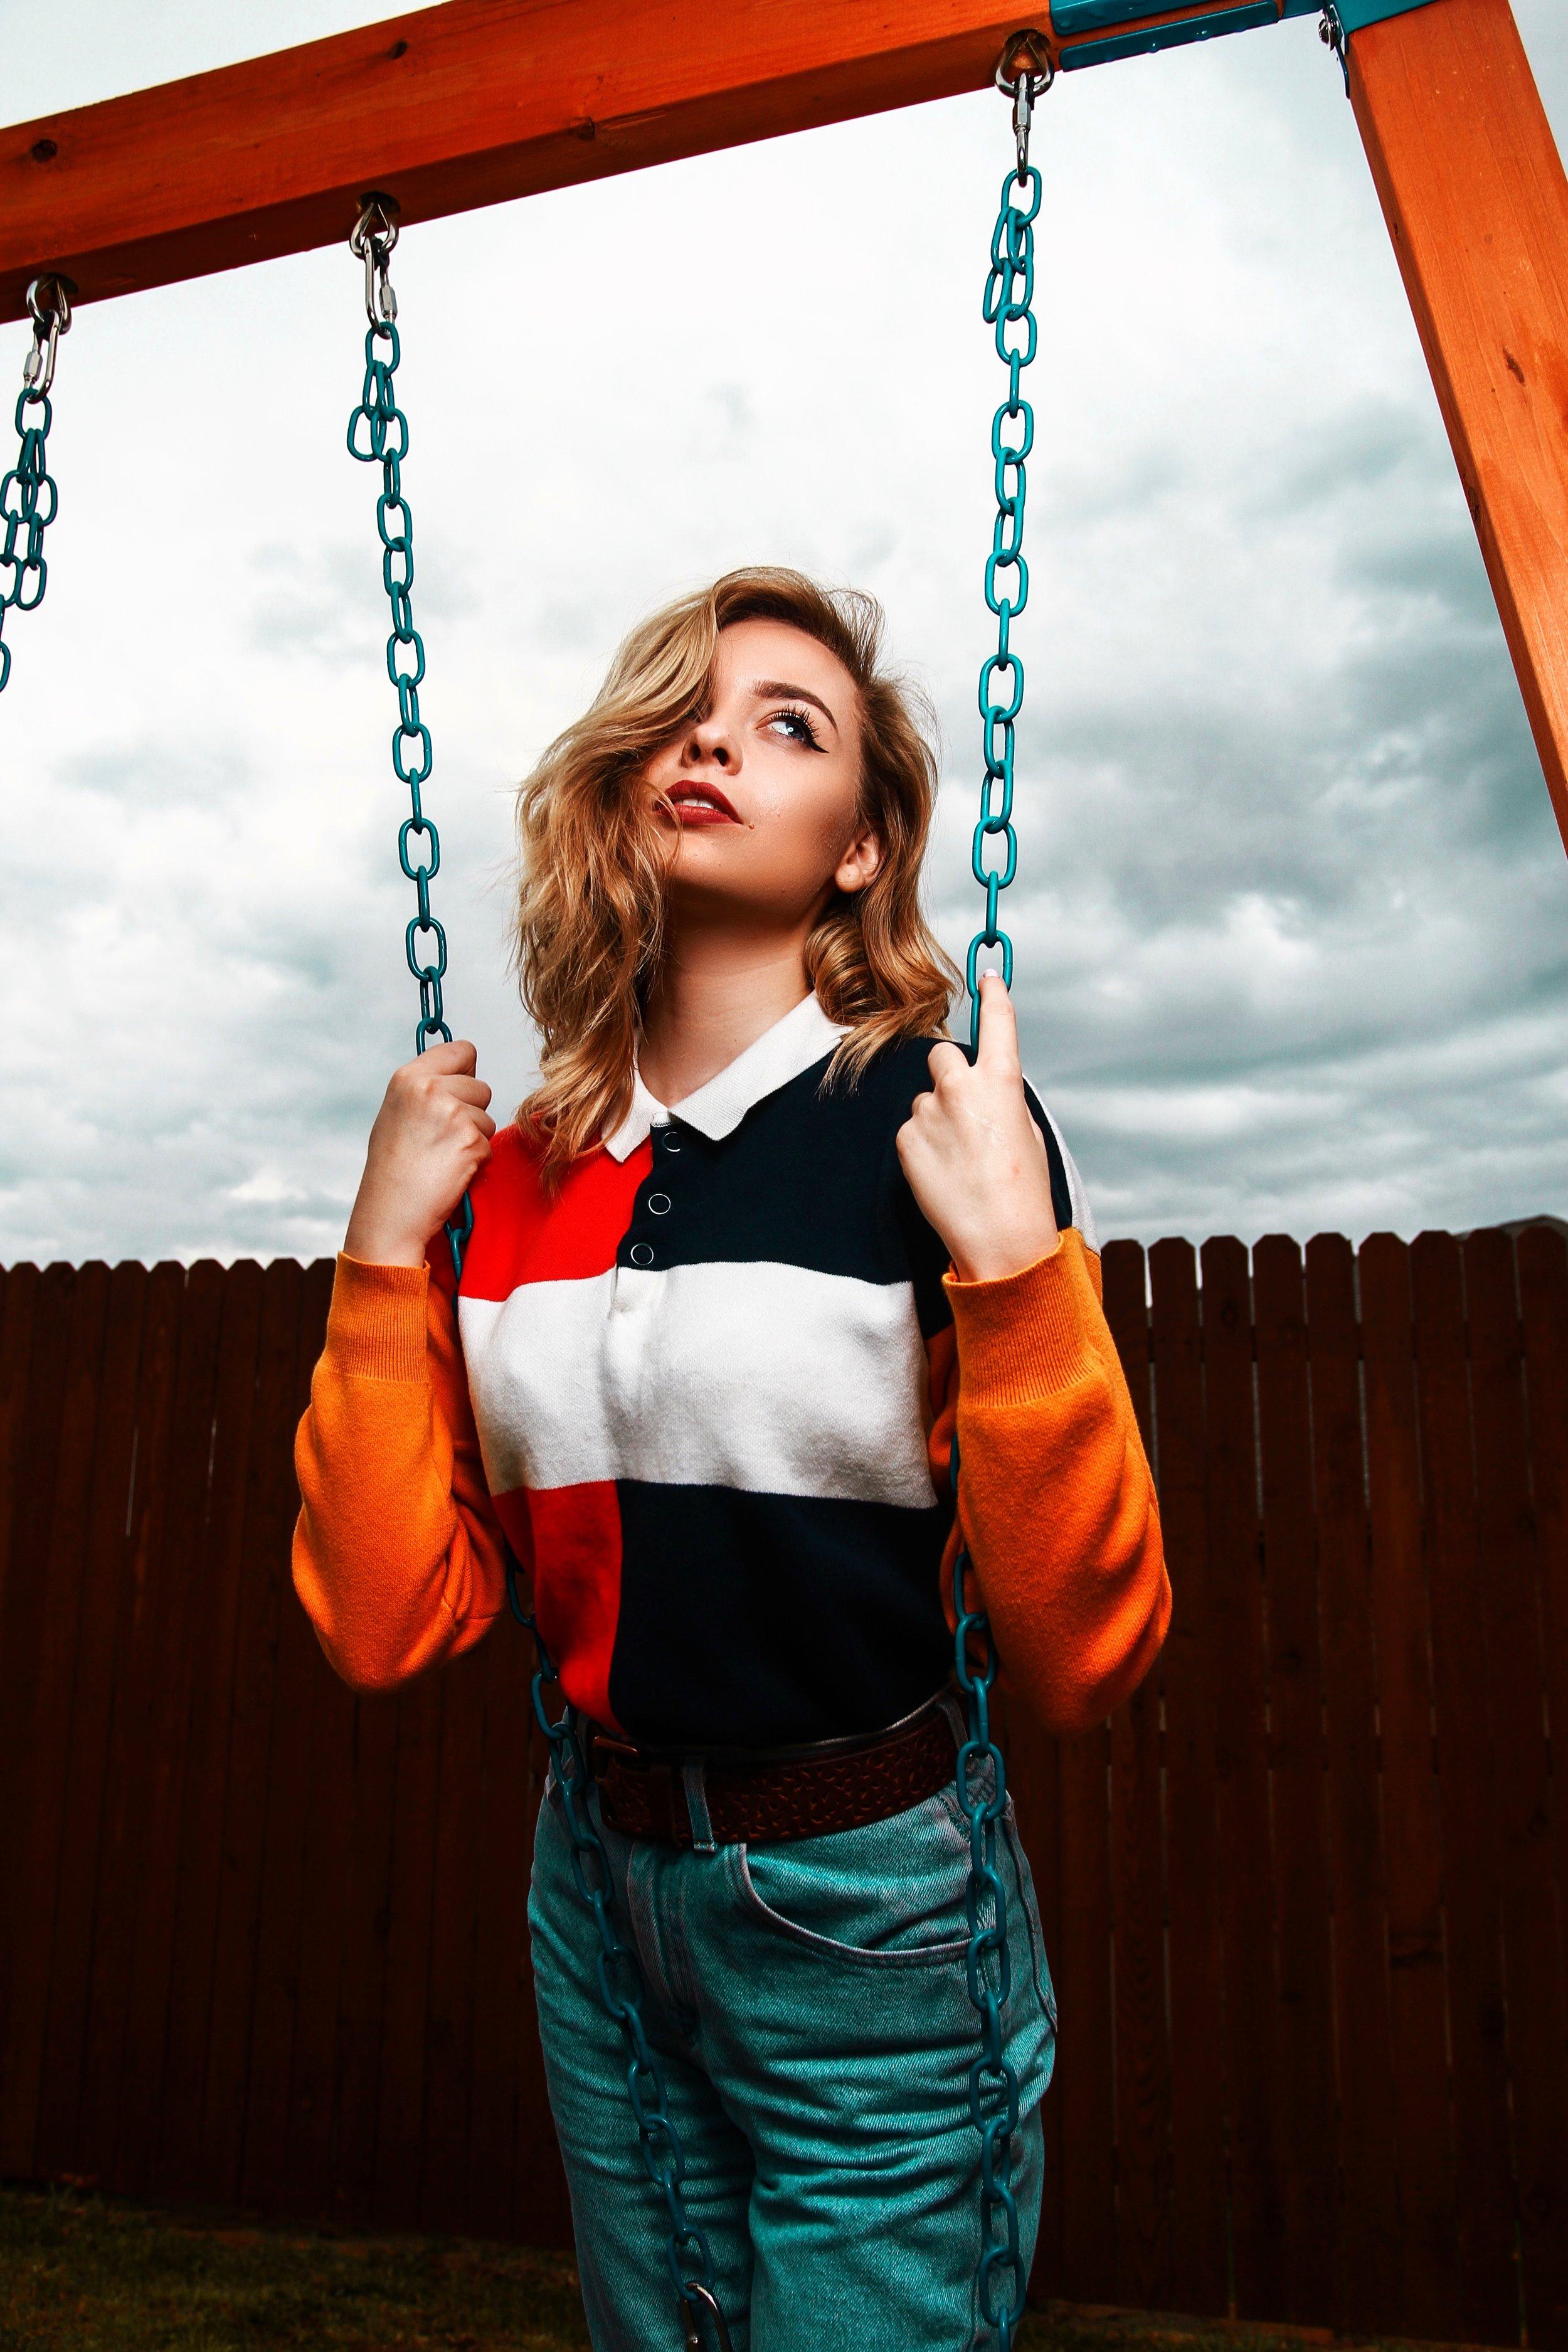 Swing free. -